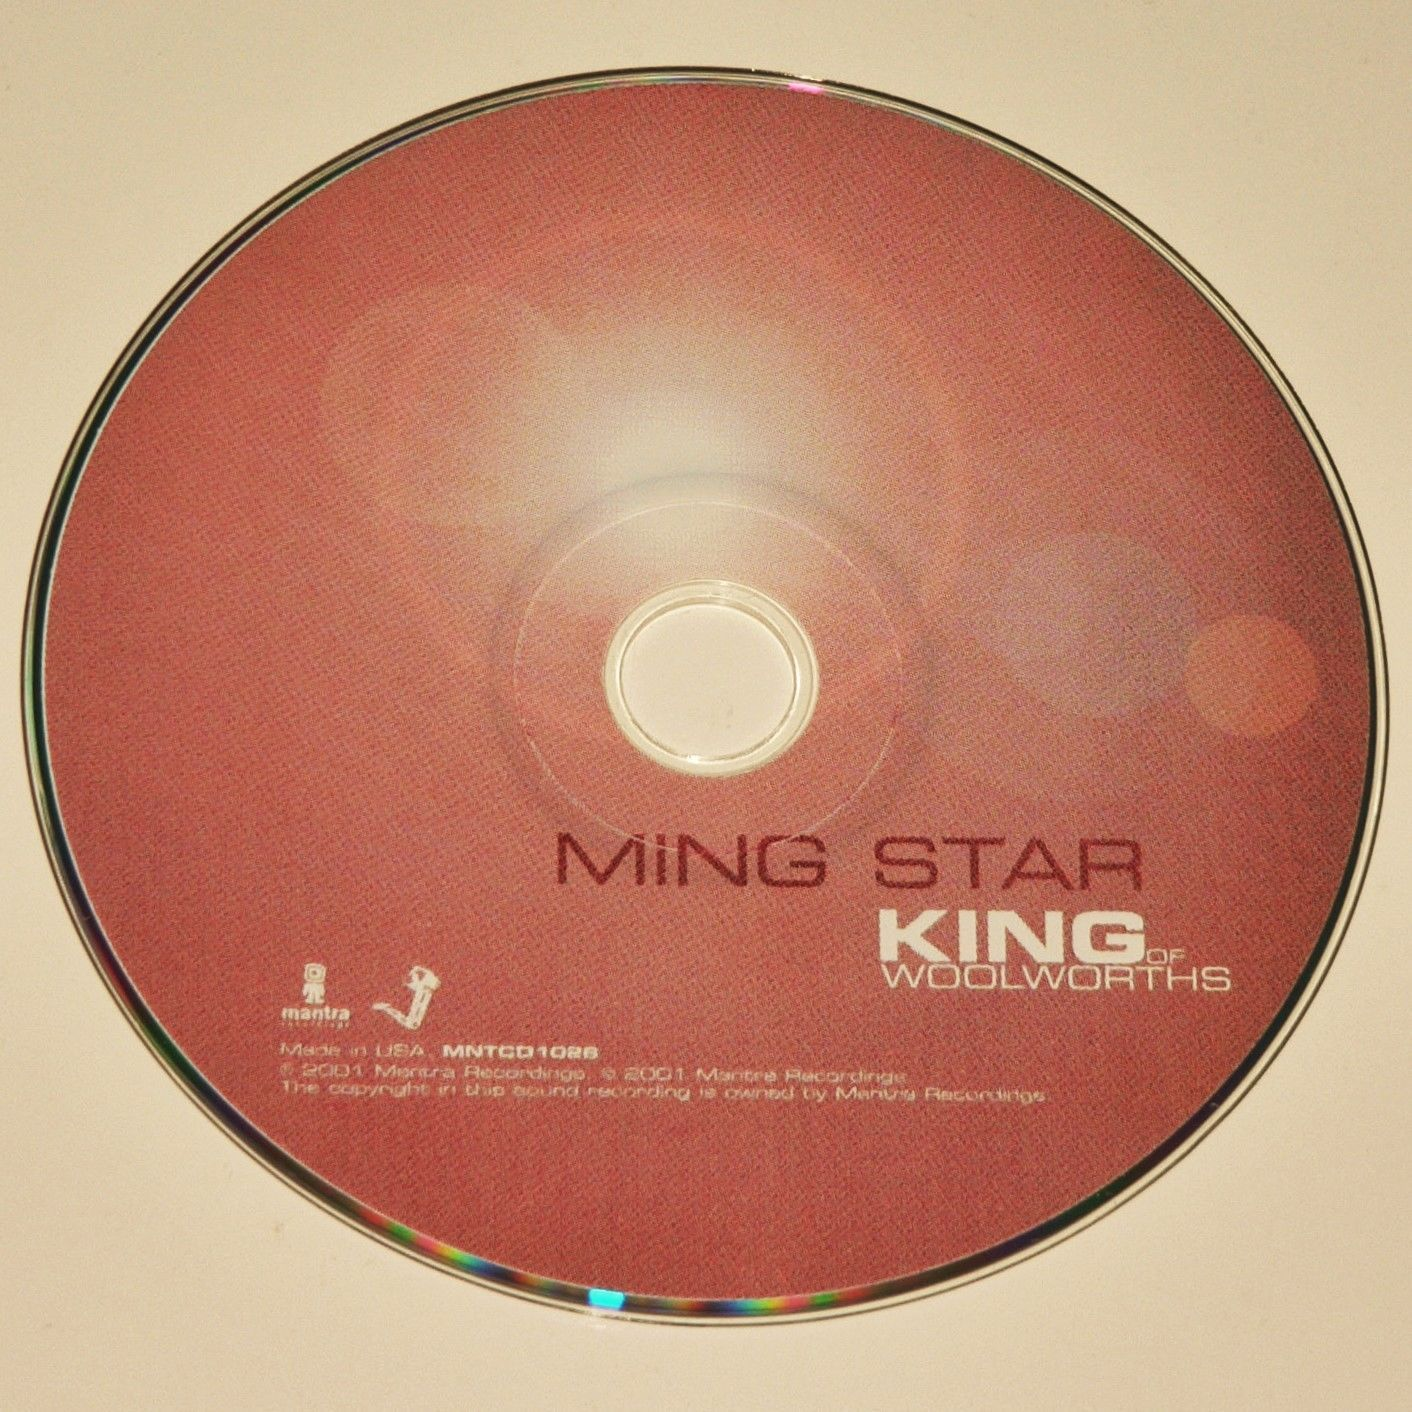 KING OF WOOLWORTHS - MING STAR - Digipak - Jon Brooks Advisory Circle Belbury VG